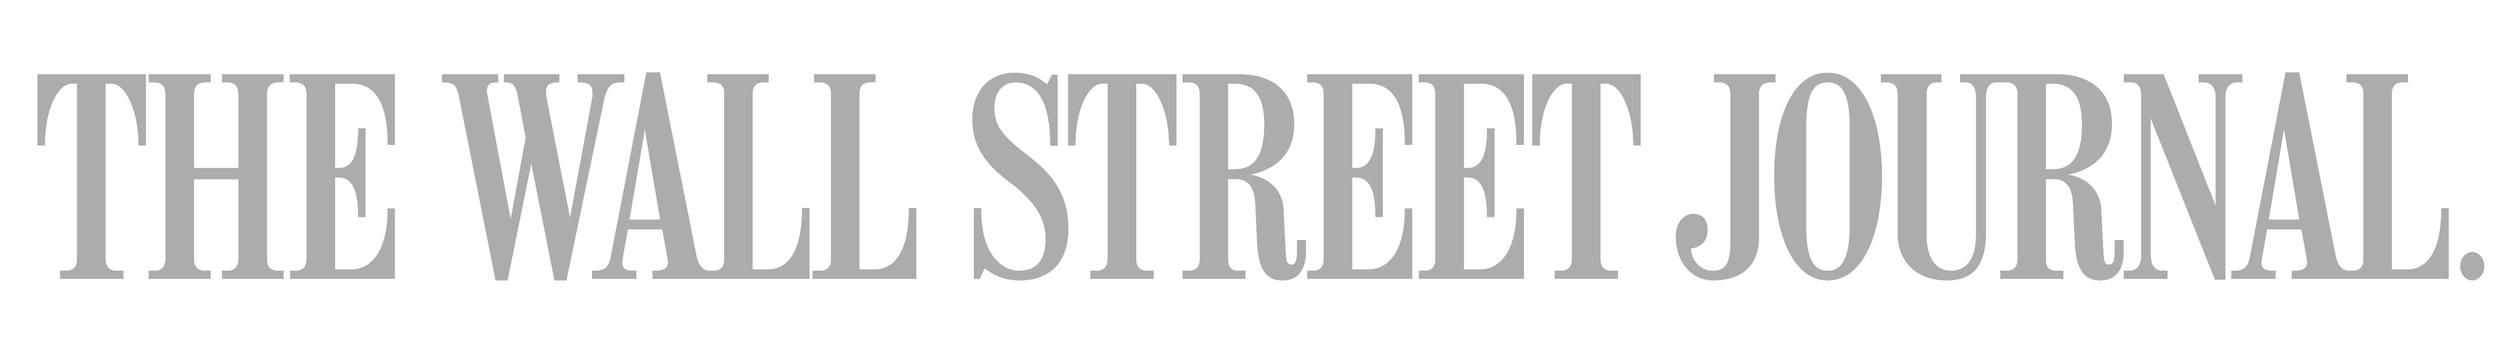 Wall_street_journal_logo-7 copy.jpg